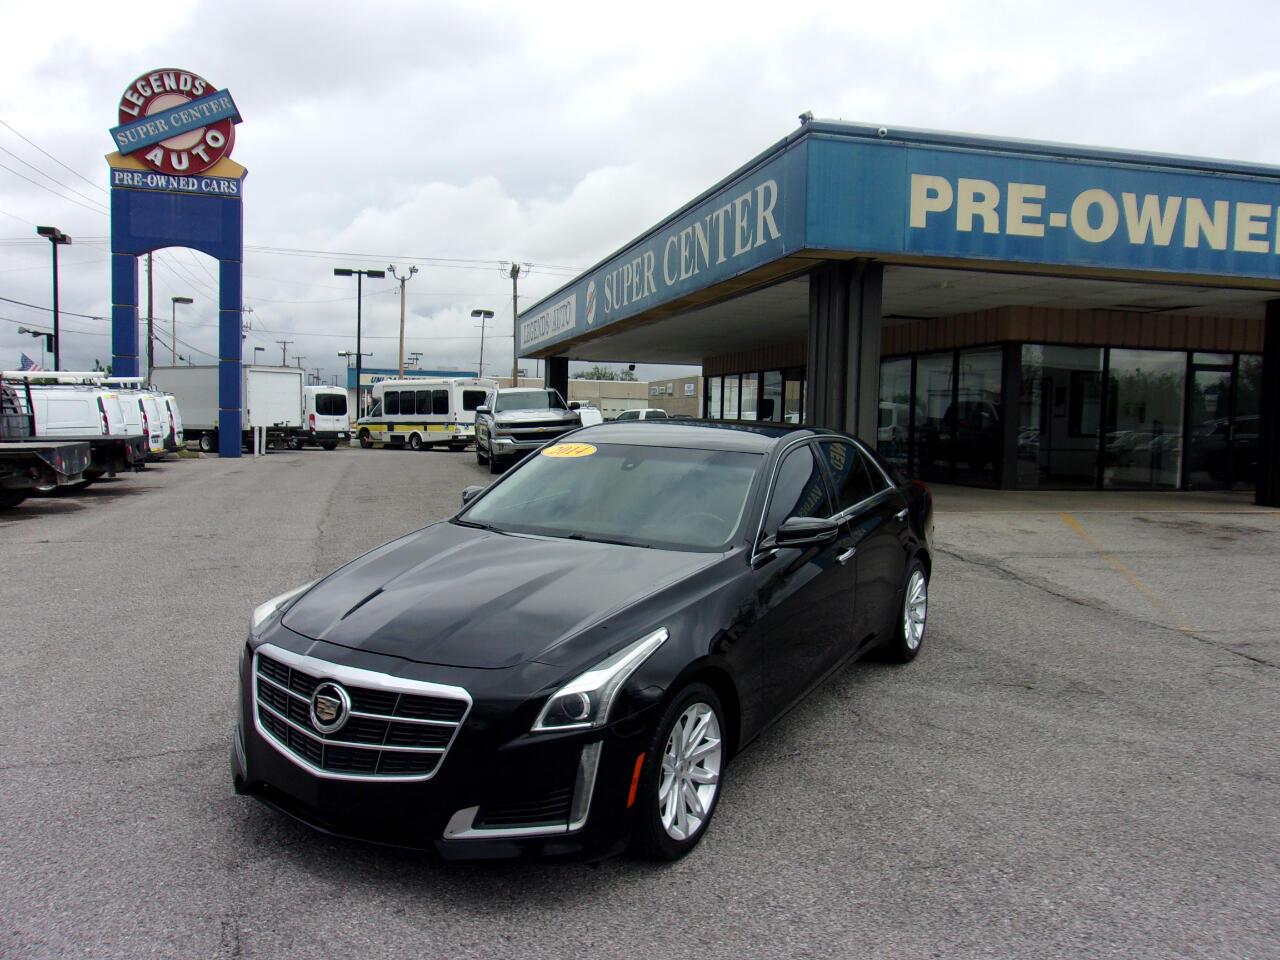 Cadillac CTS Sedan 4dr Sdn 2.0L Turbo RWD 2014